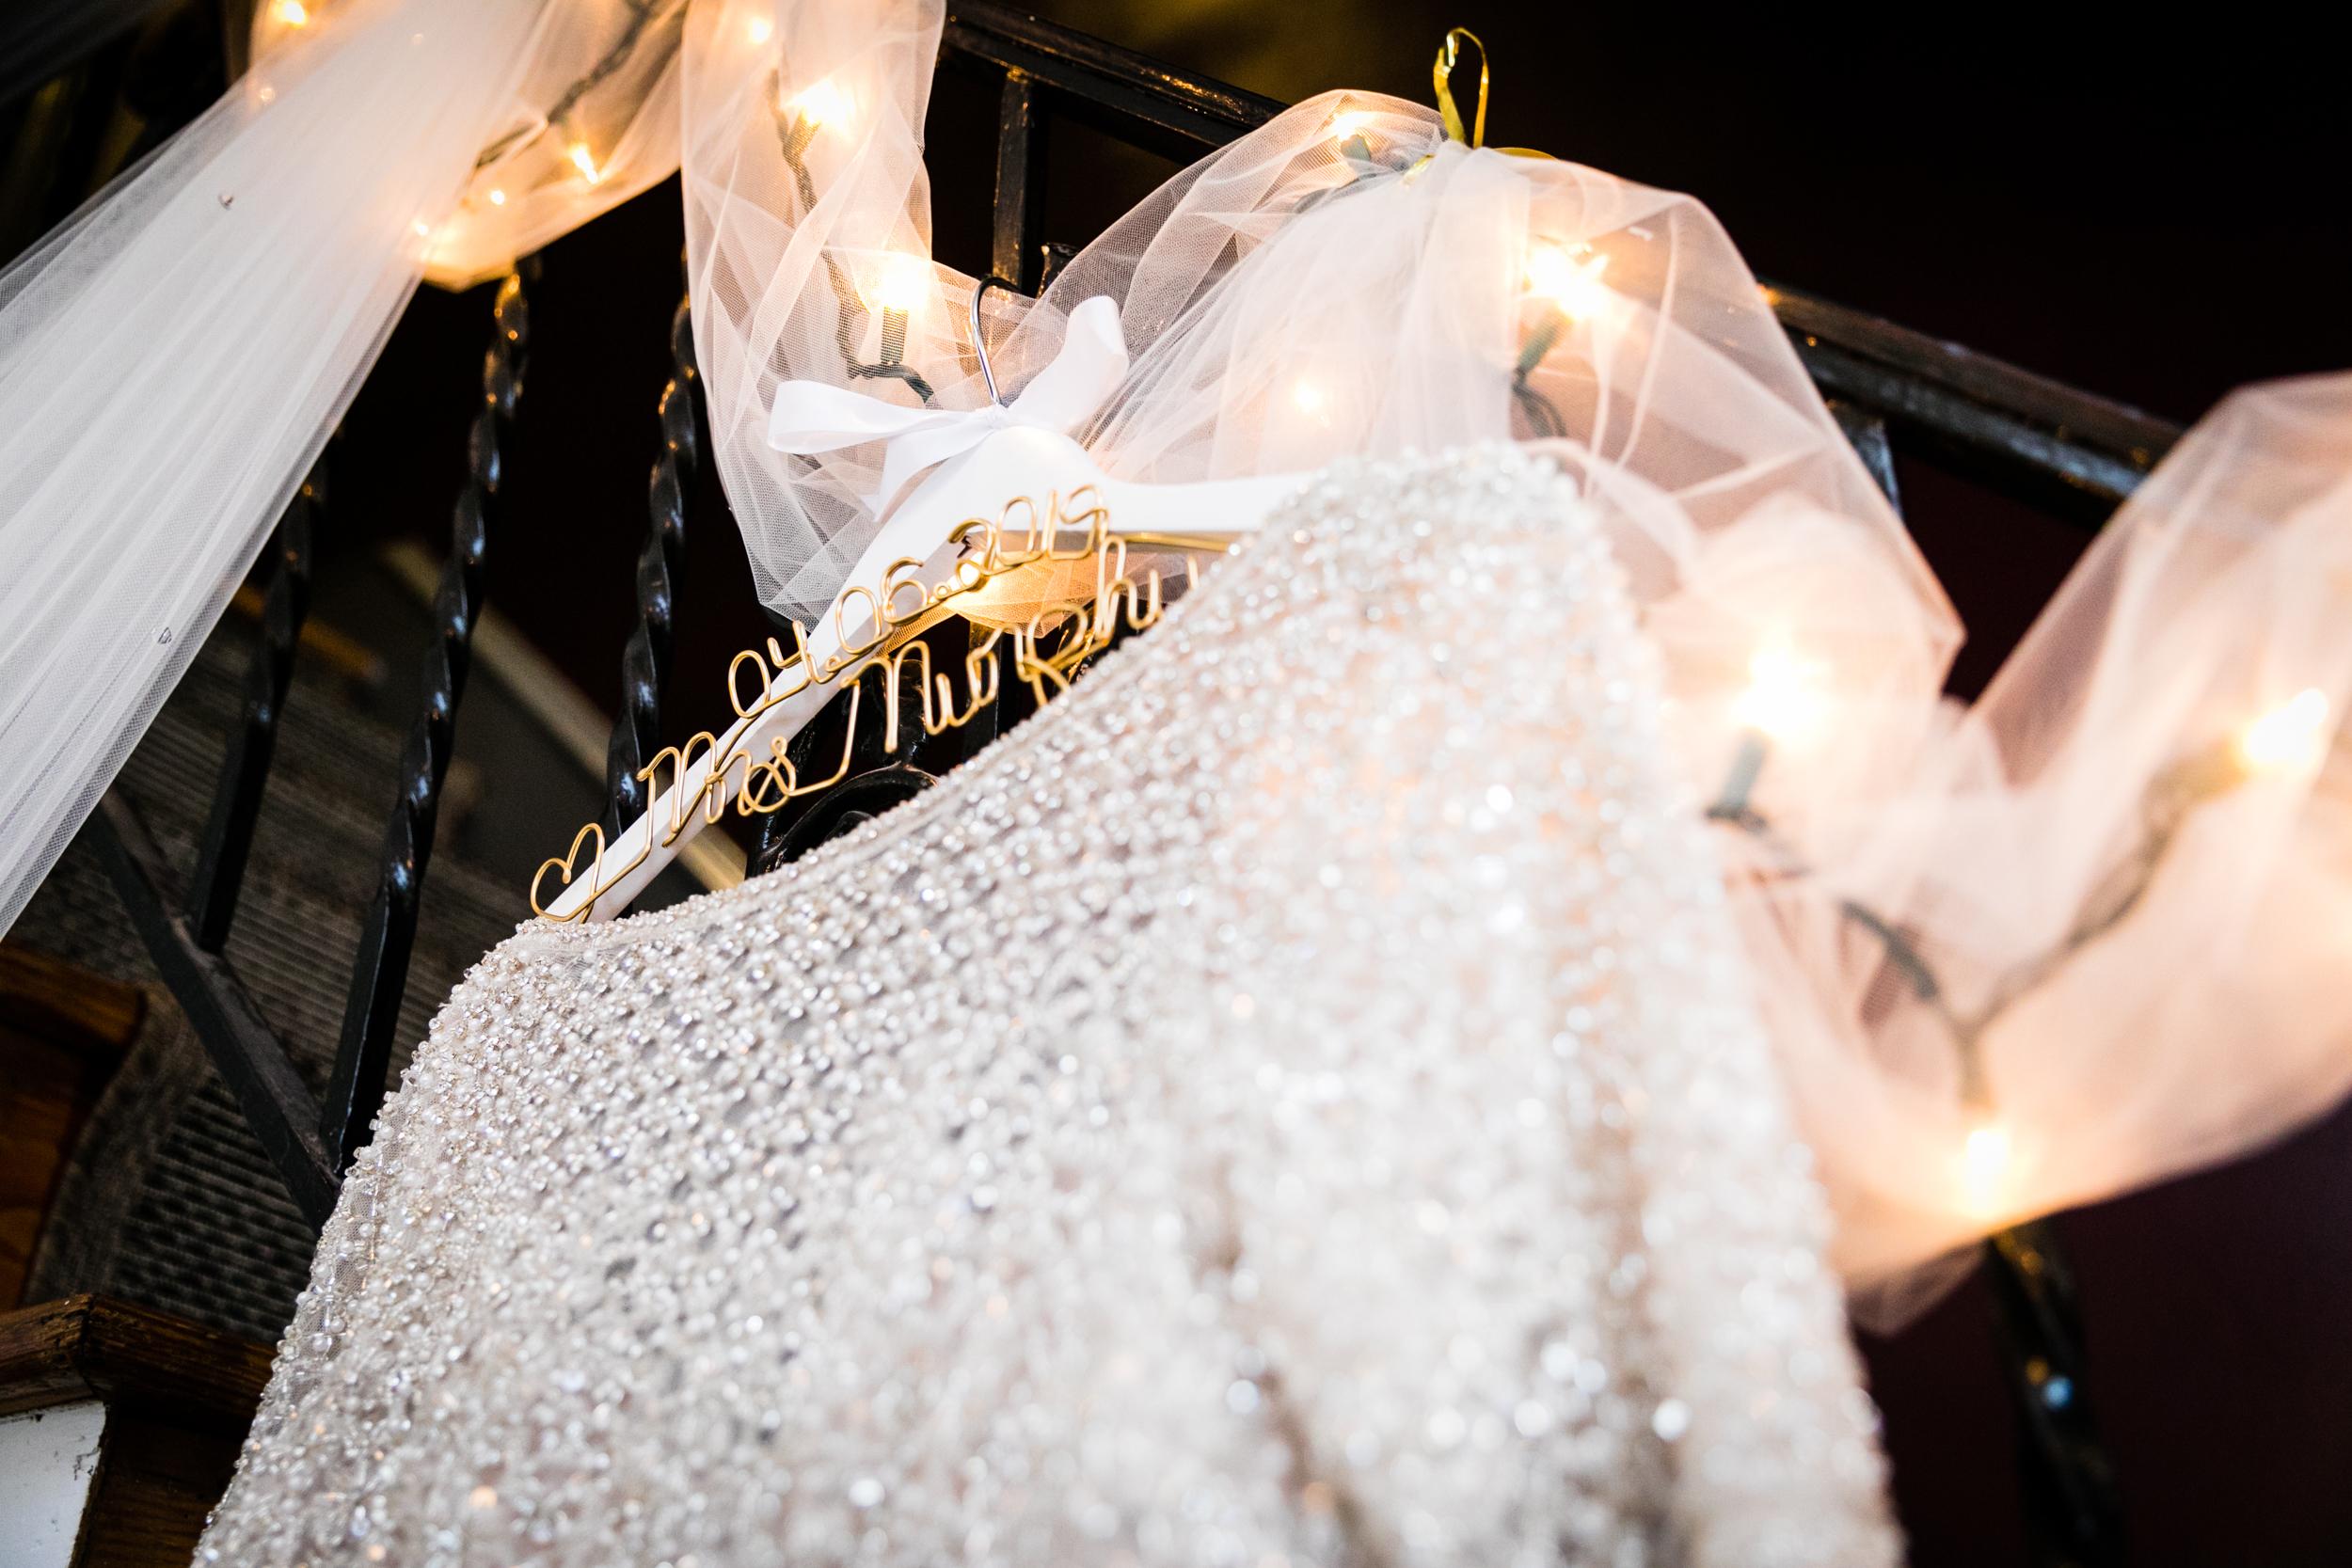 CELEBRATIONS BENSALEM WEDDING PHOTOGRAPHY-1.jpg